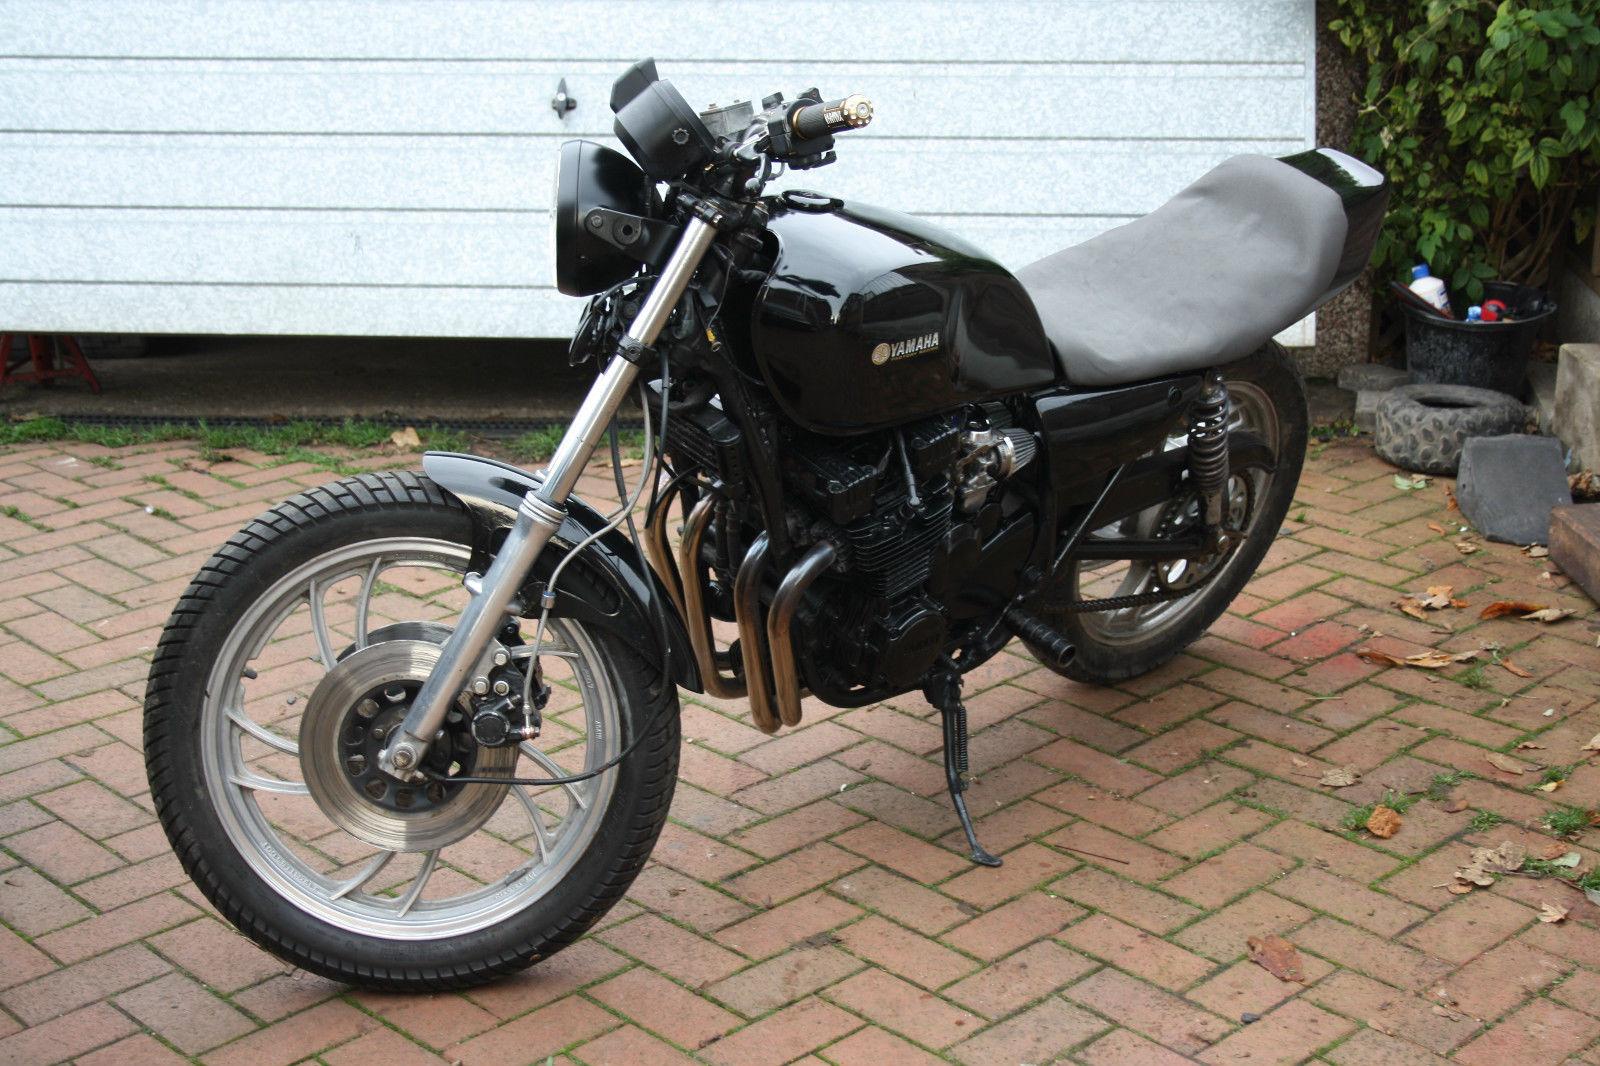 1981 yamaha xj550 black cafe racer  flat tracker  twin shock yamaha xj 550 service manual pdf yamaha xj 550 maxim manual